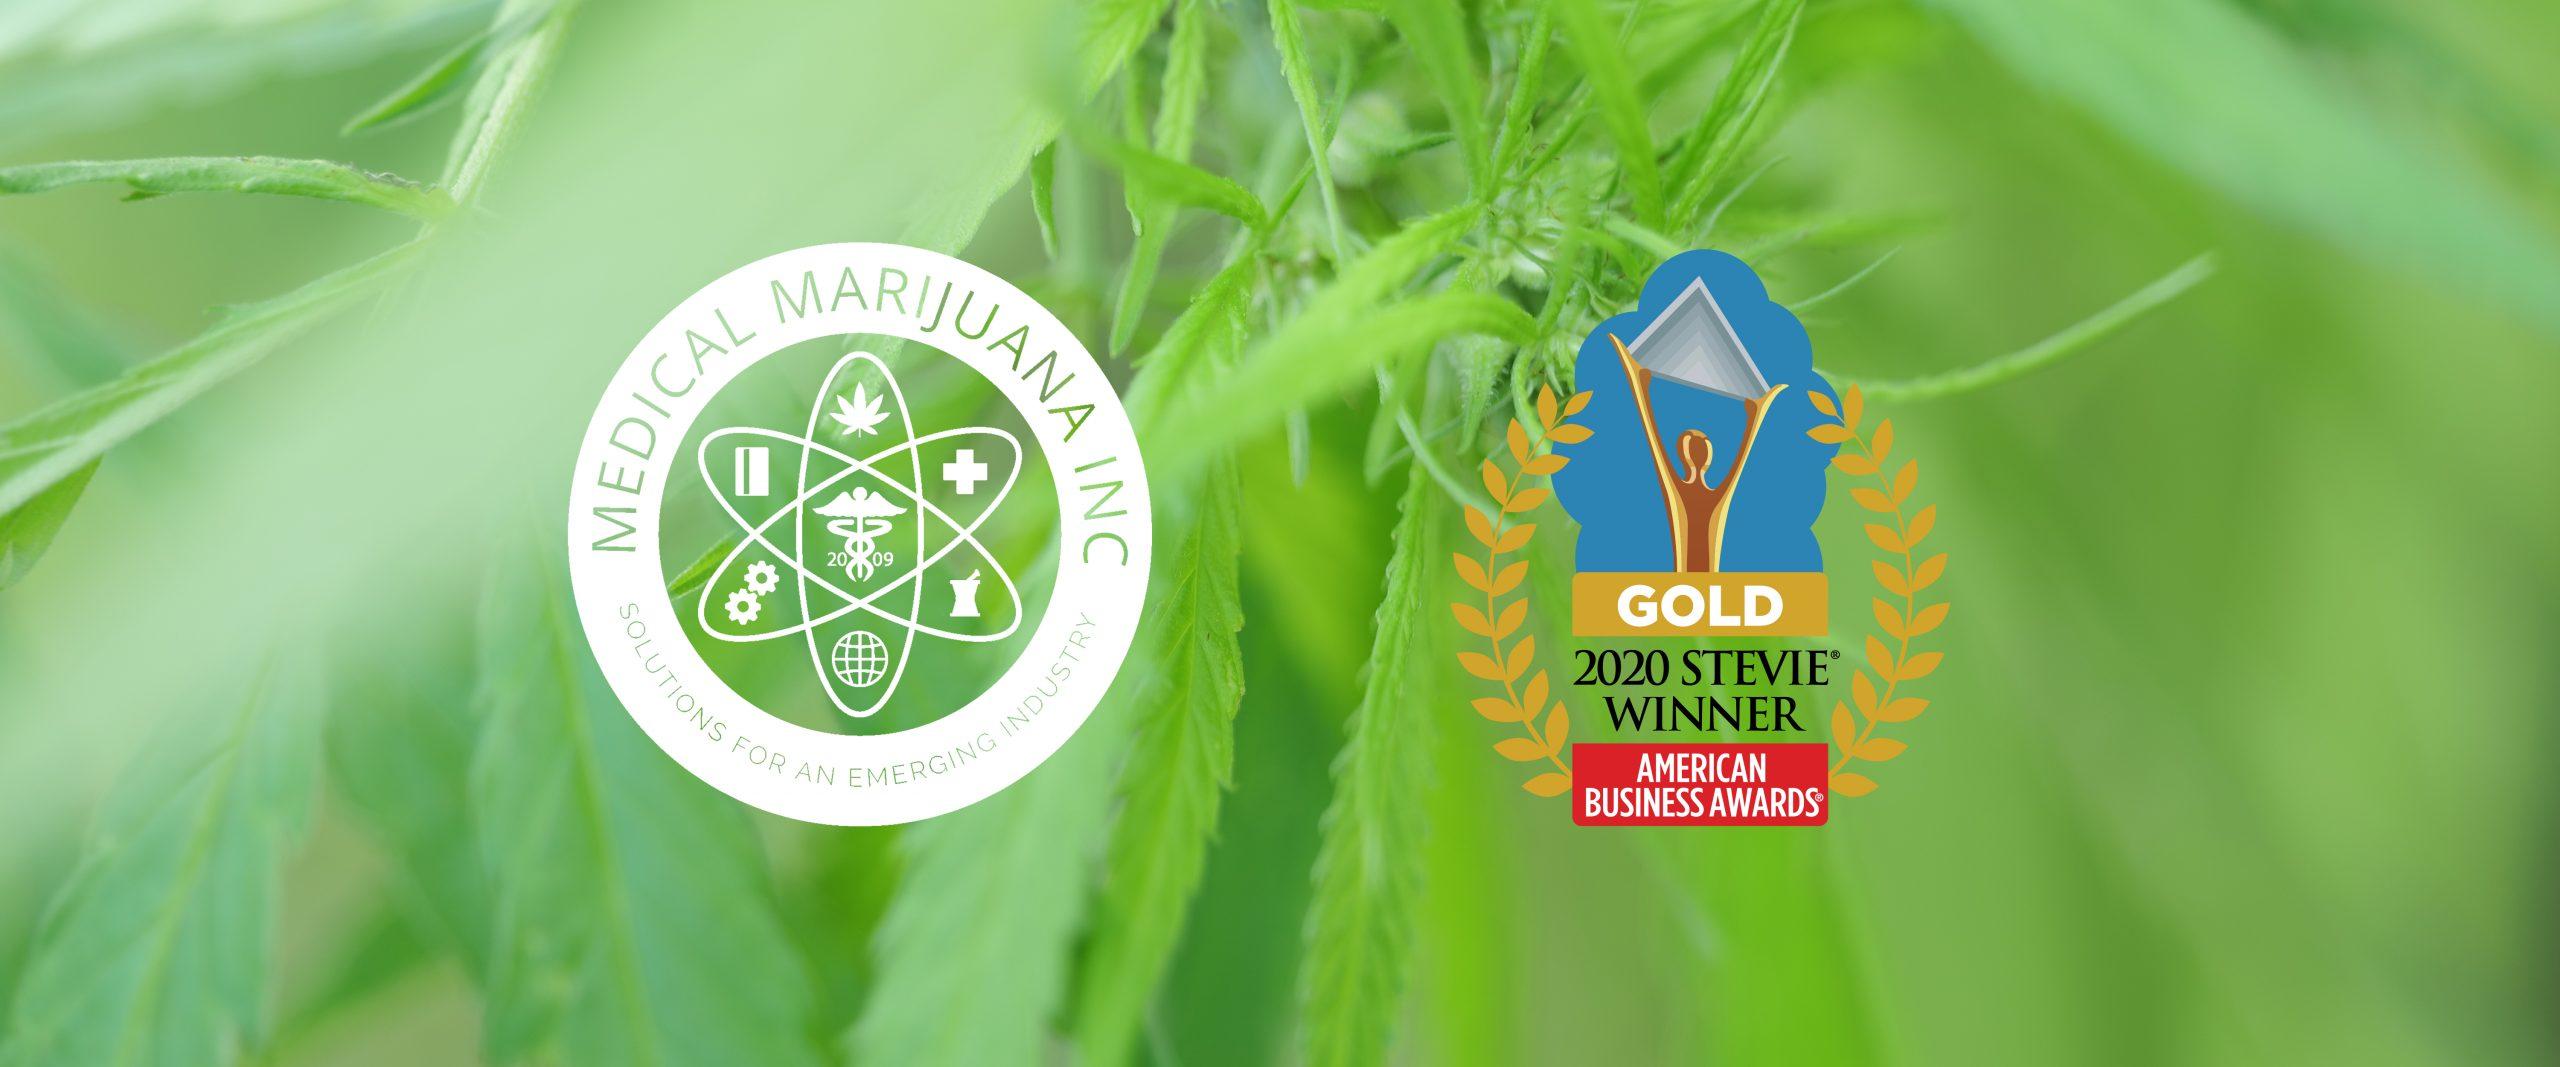 Medical Marijuana, Inc. Gold Stevie Award Winner